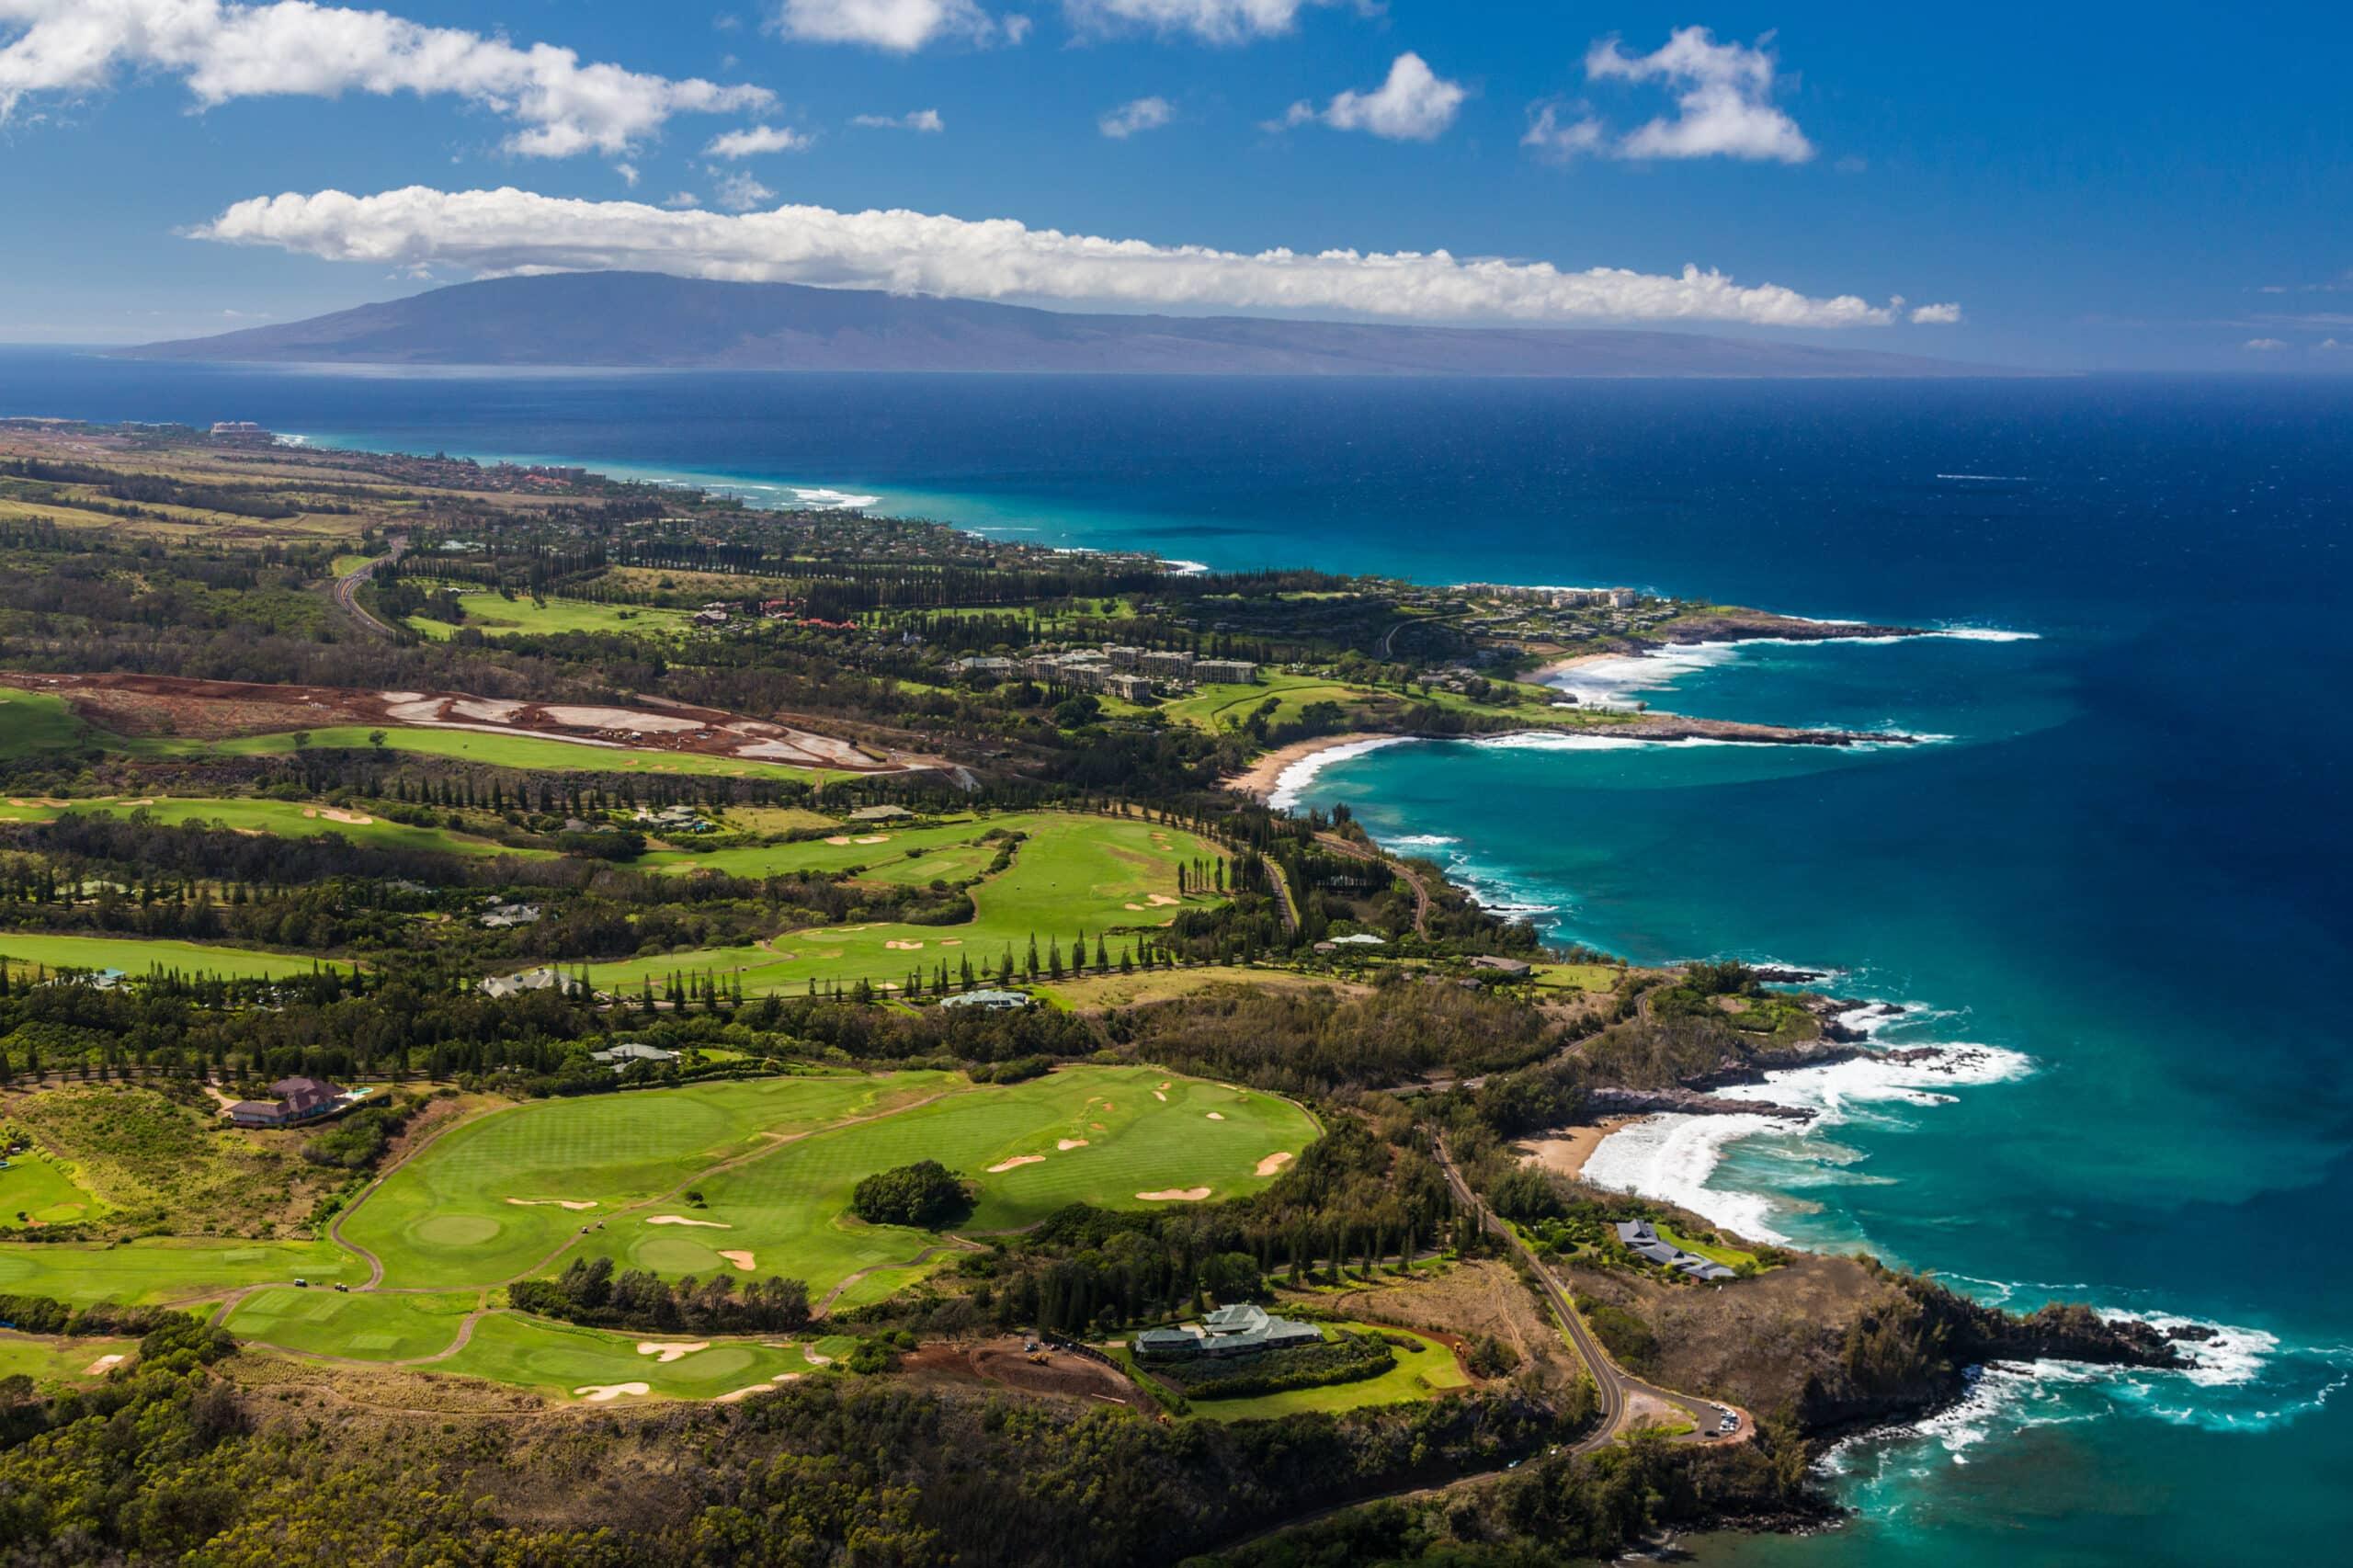 kapalua Hawaii Tourism Authority HTA Tor Johnson.tif scaled